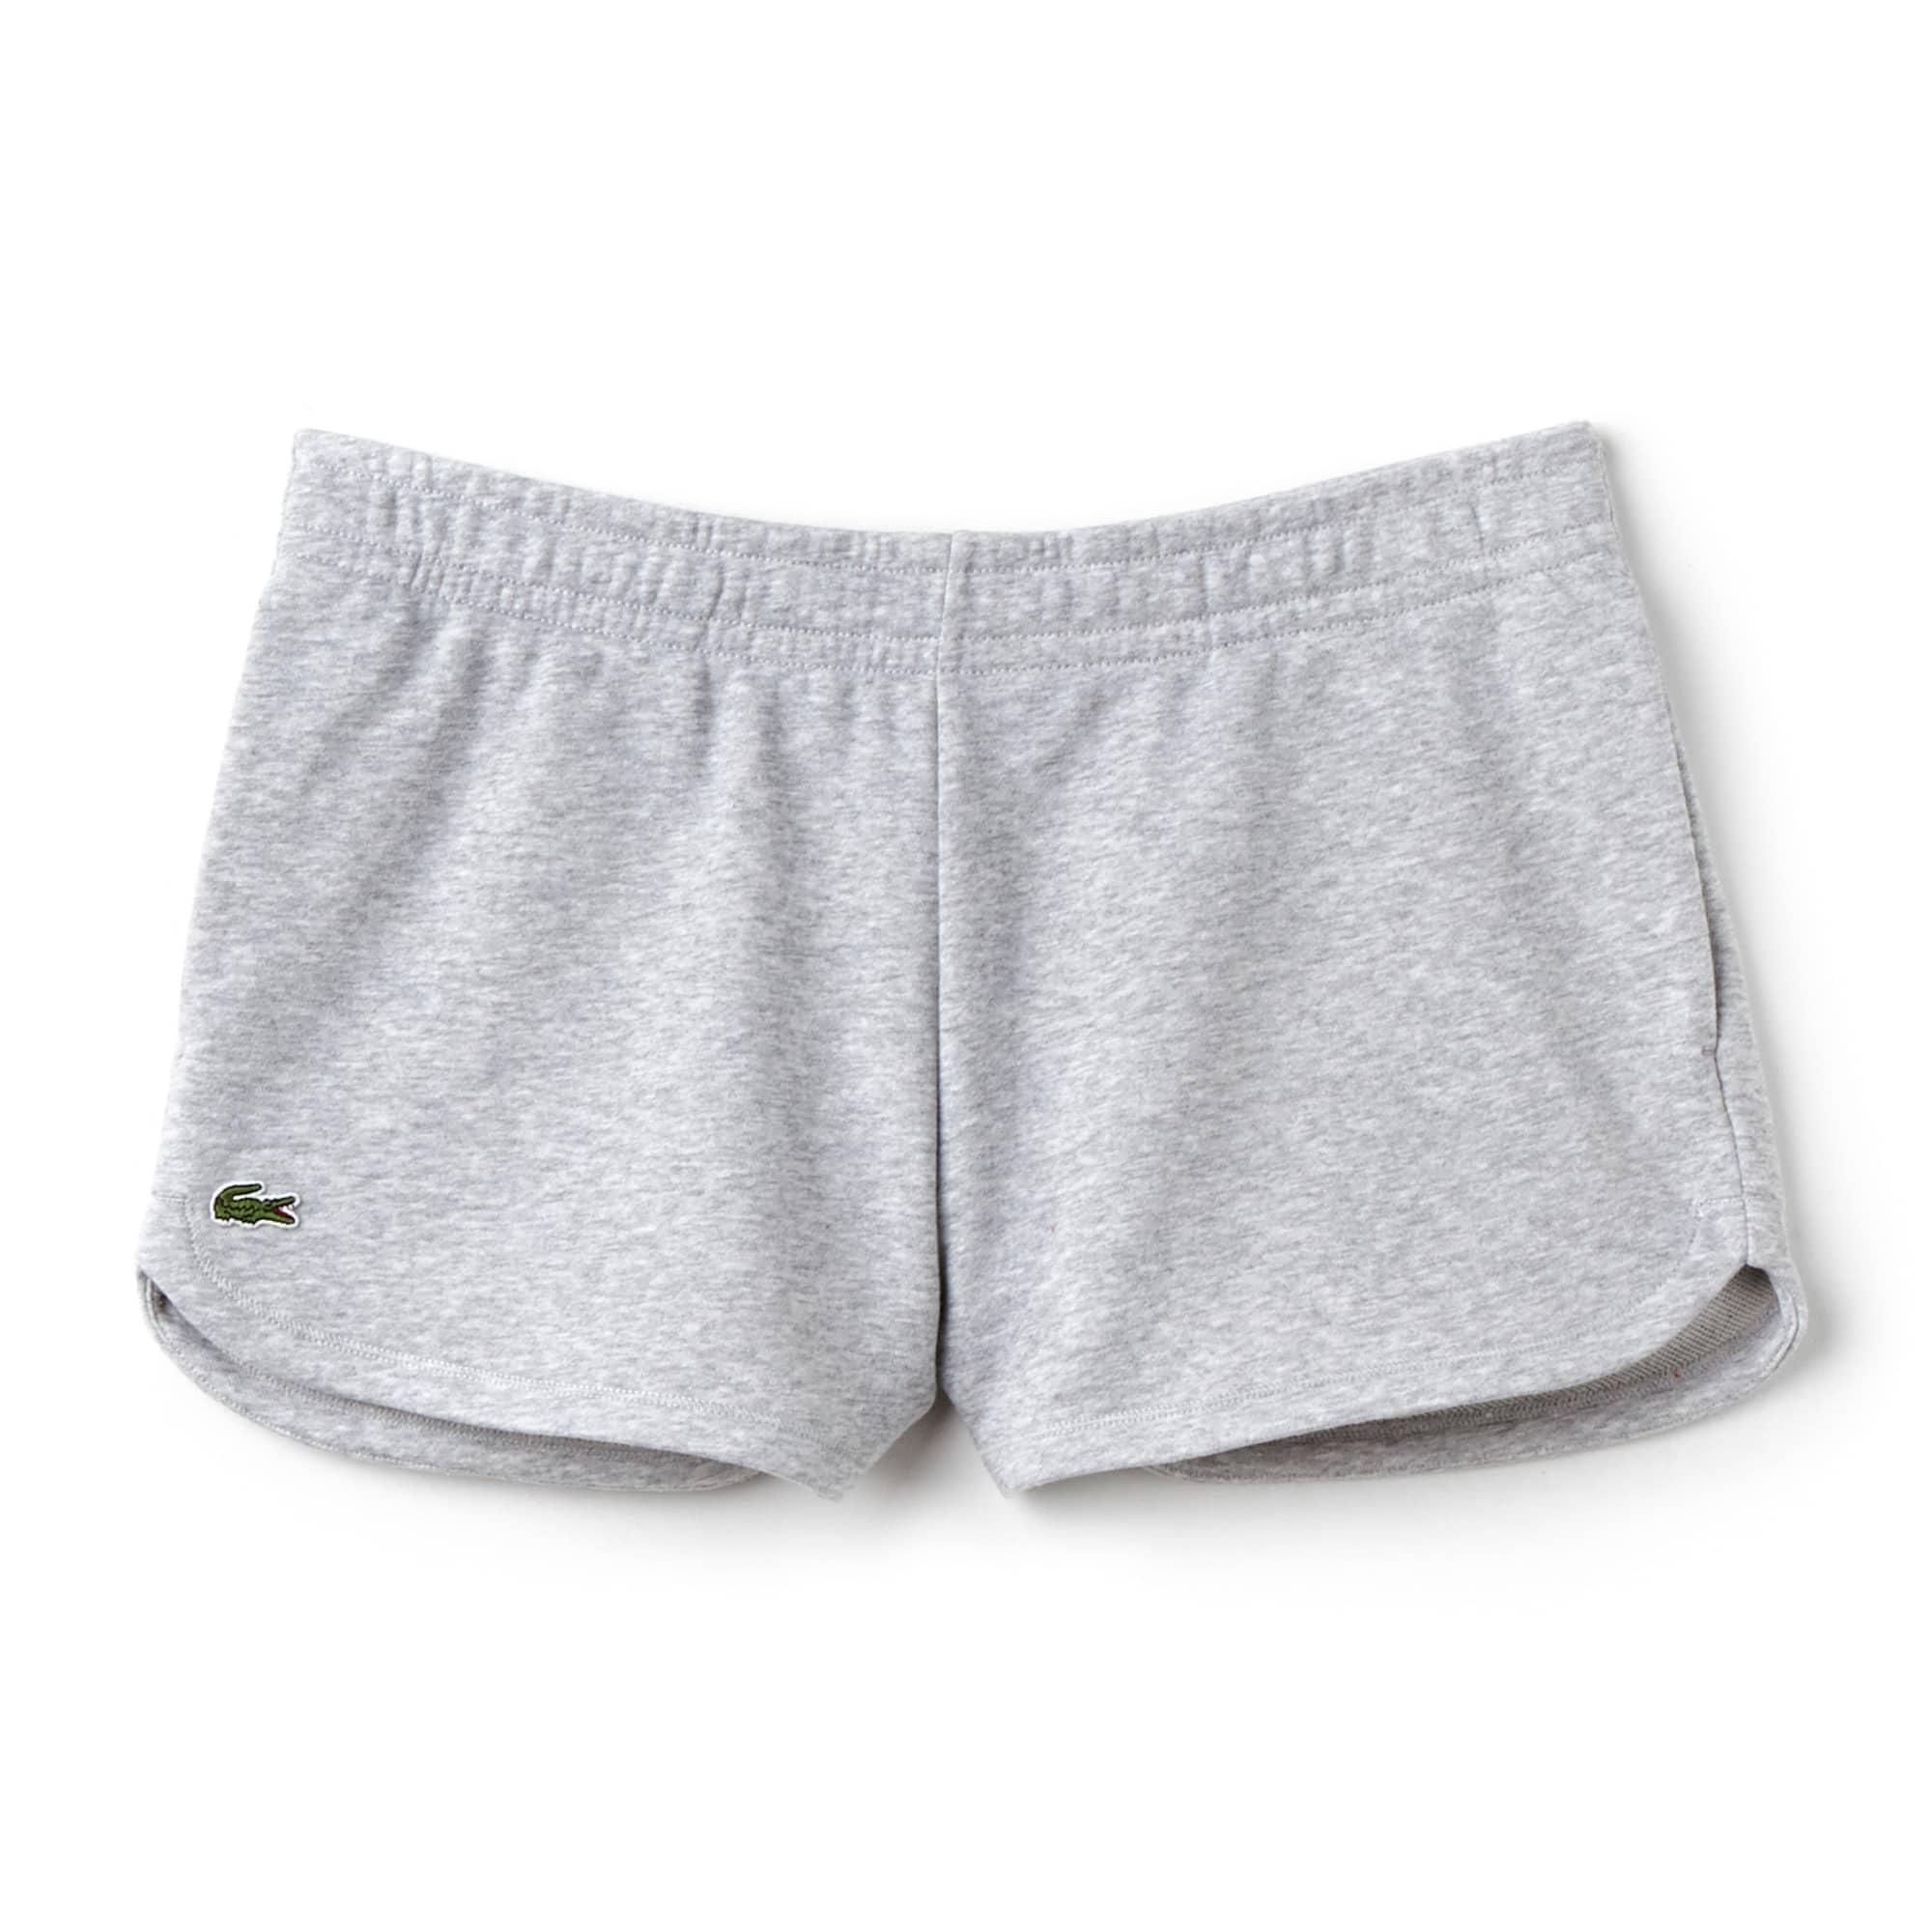 Pantaloncini Tennis Lacoste SPORT in cotone tinta unita